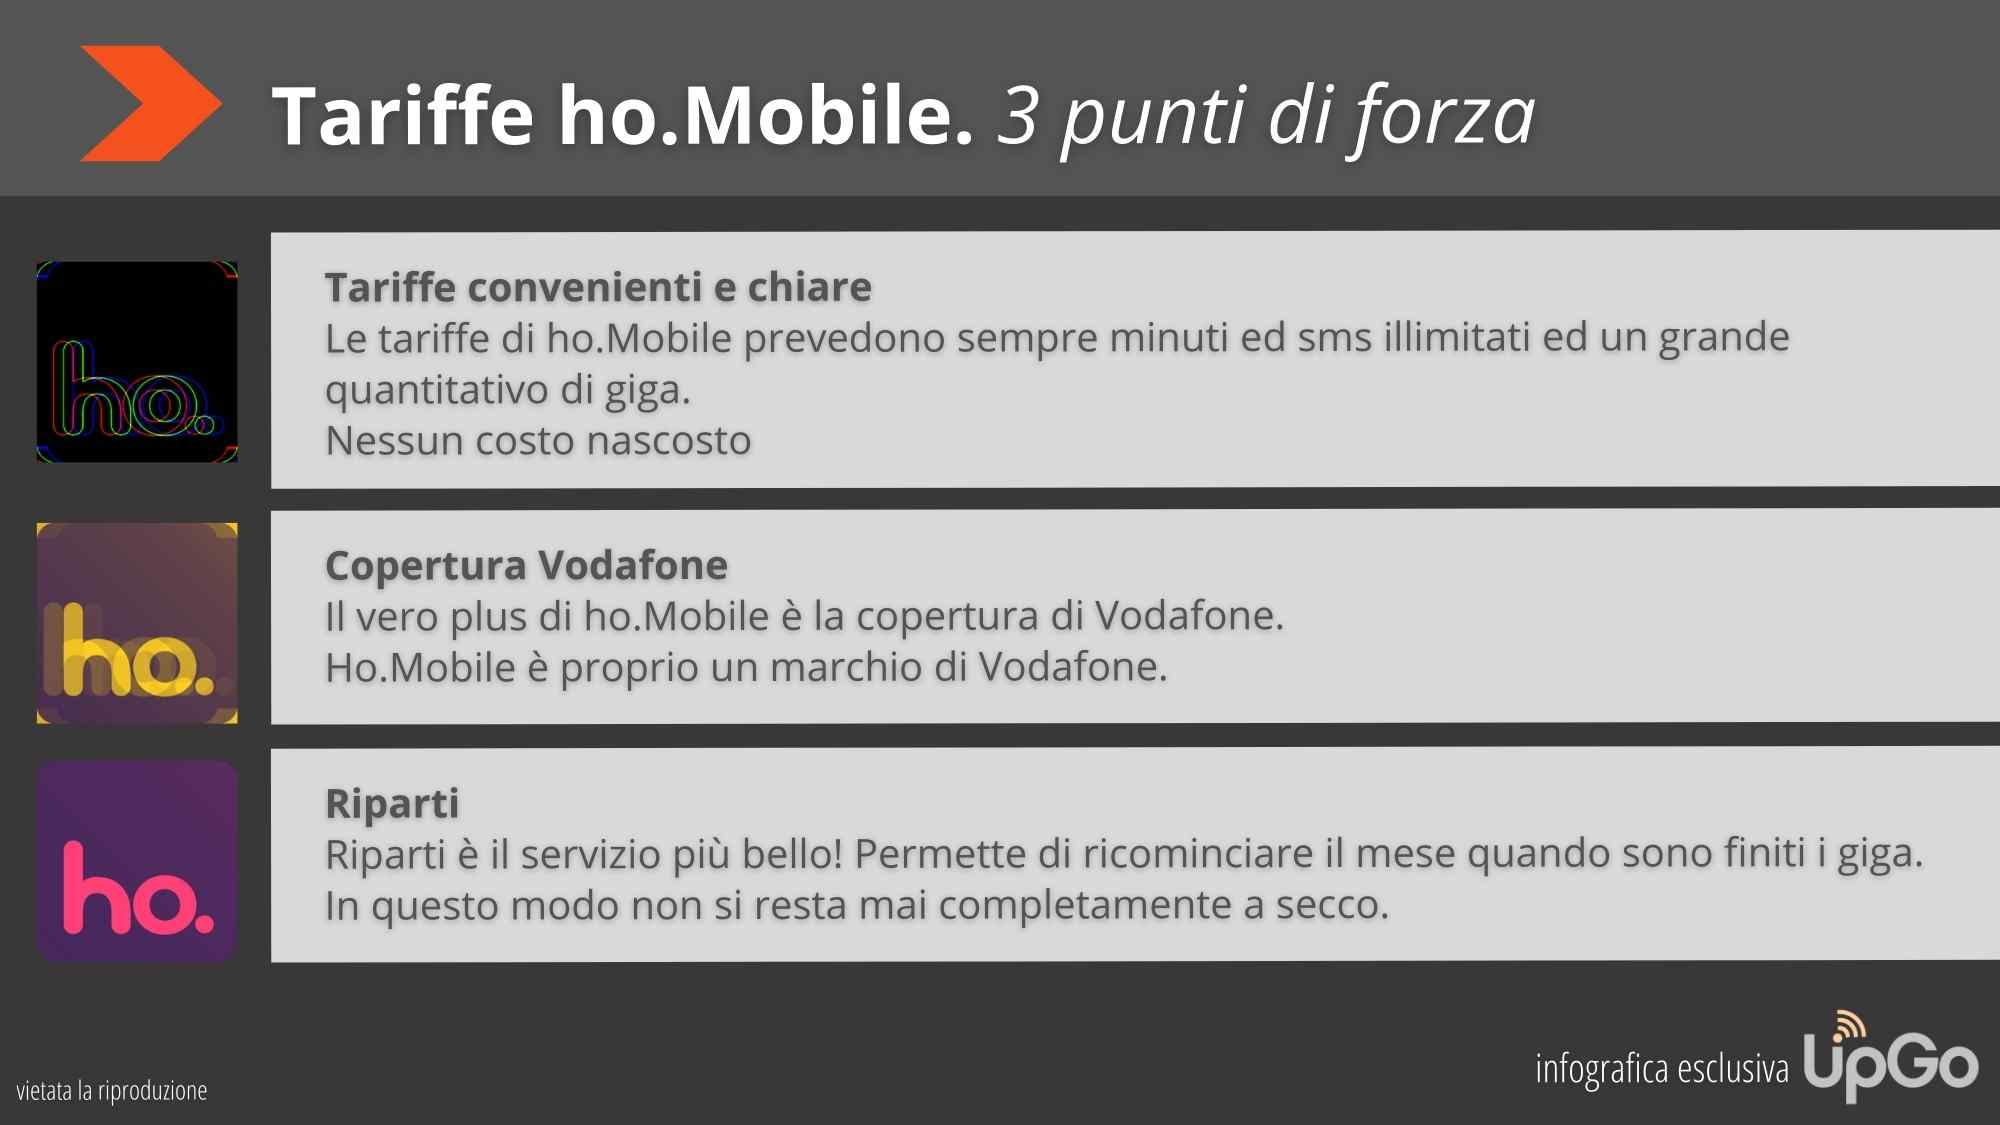 Tariffe Ho Mobile infografica vantaggi